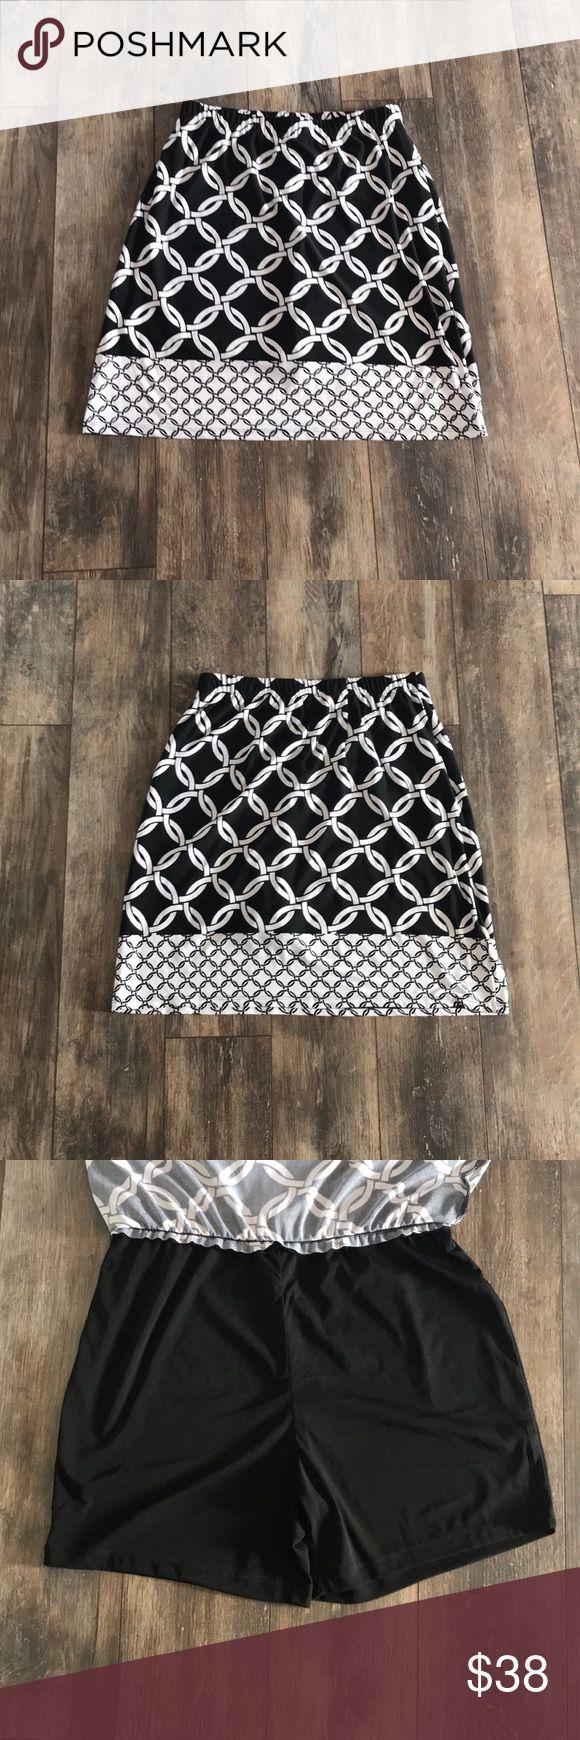 Susan Graver XXS Black & White Patterned Skort Susan Graver Size XXS 95% Polyester Black & White Patterned Skort Susan Graver Skirts